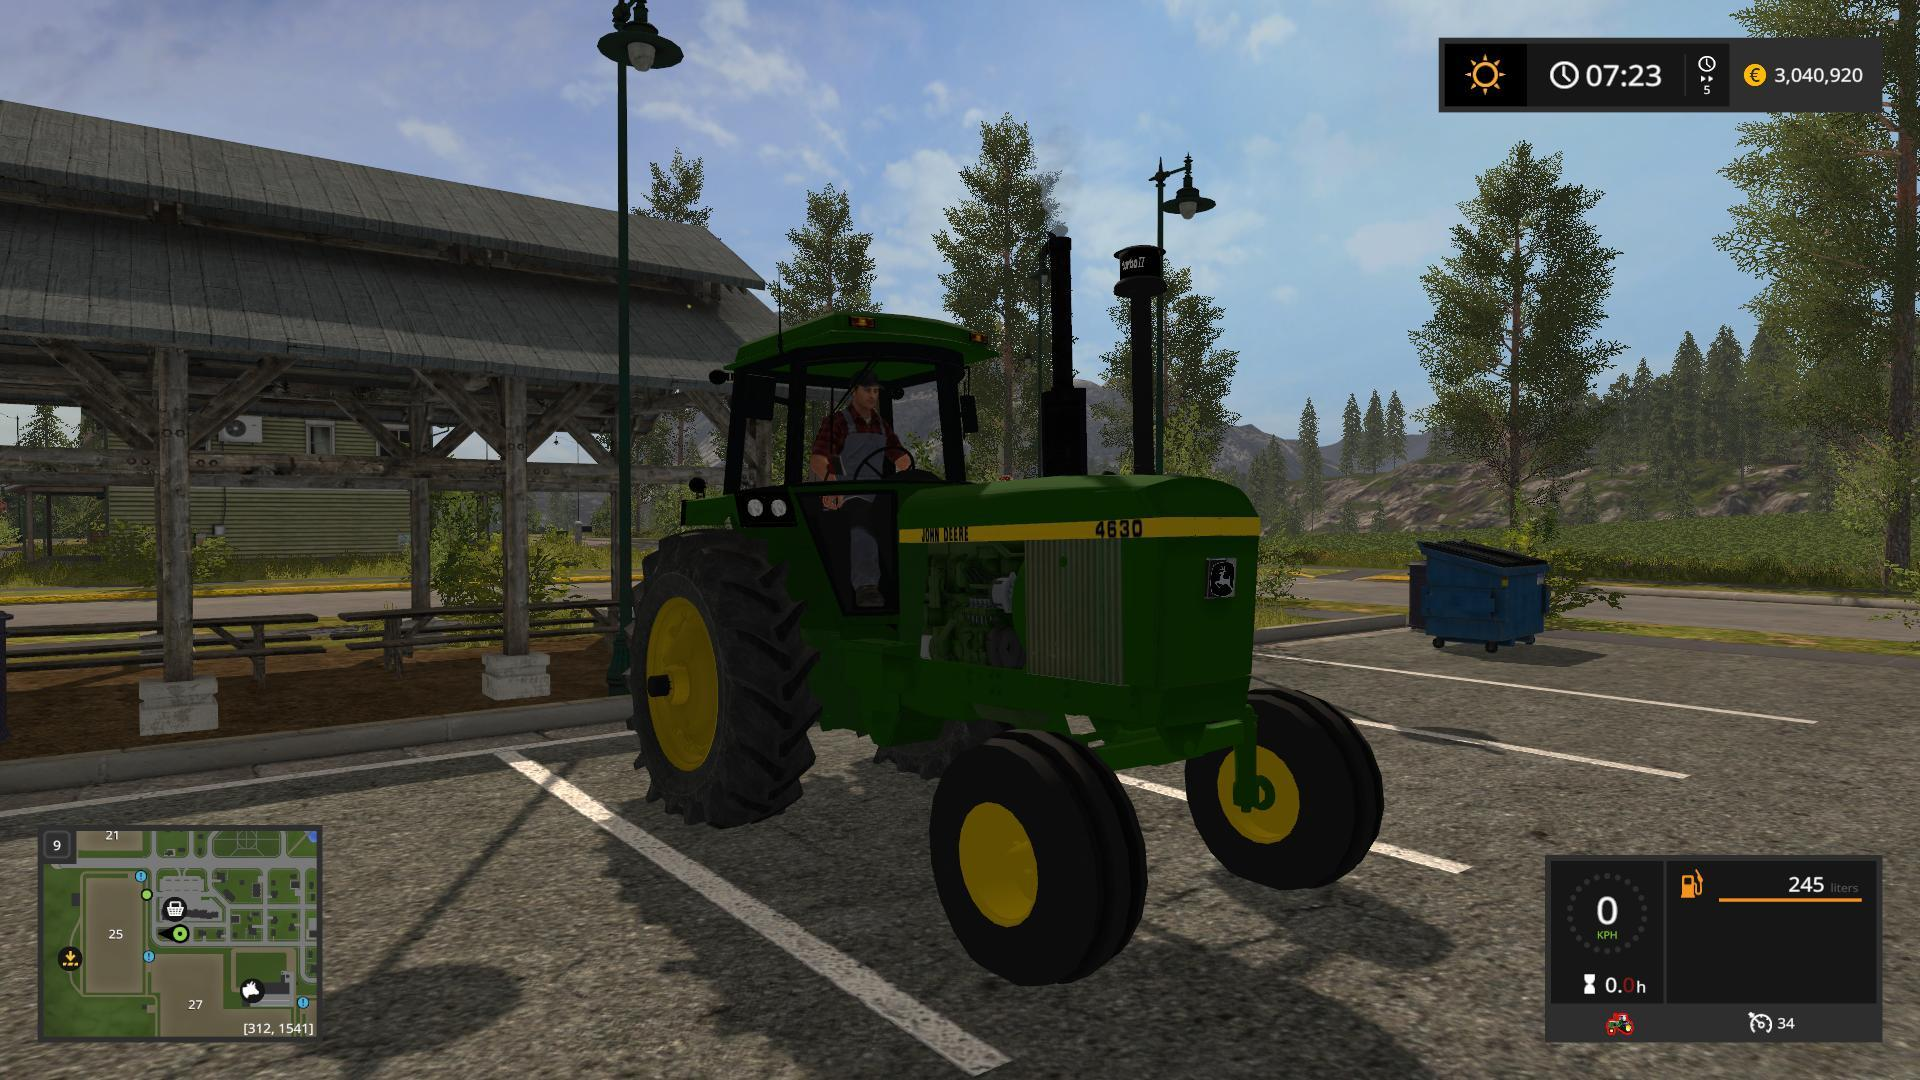 FS17 OLD IRON JOHN DEERE 4630 V1 0 - Farming simulator 2019 / 2017